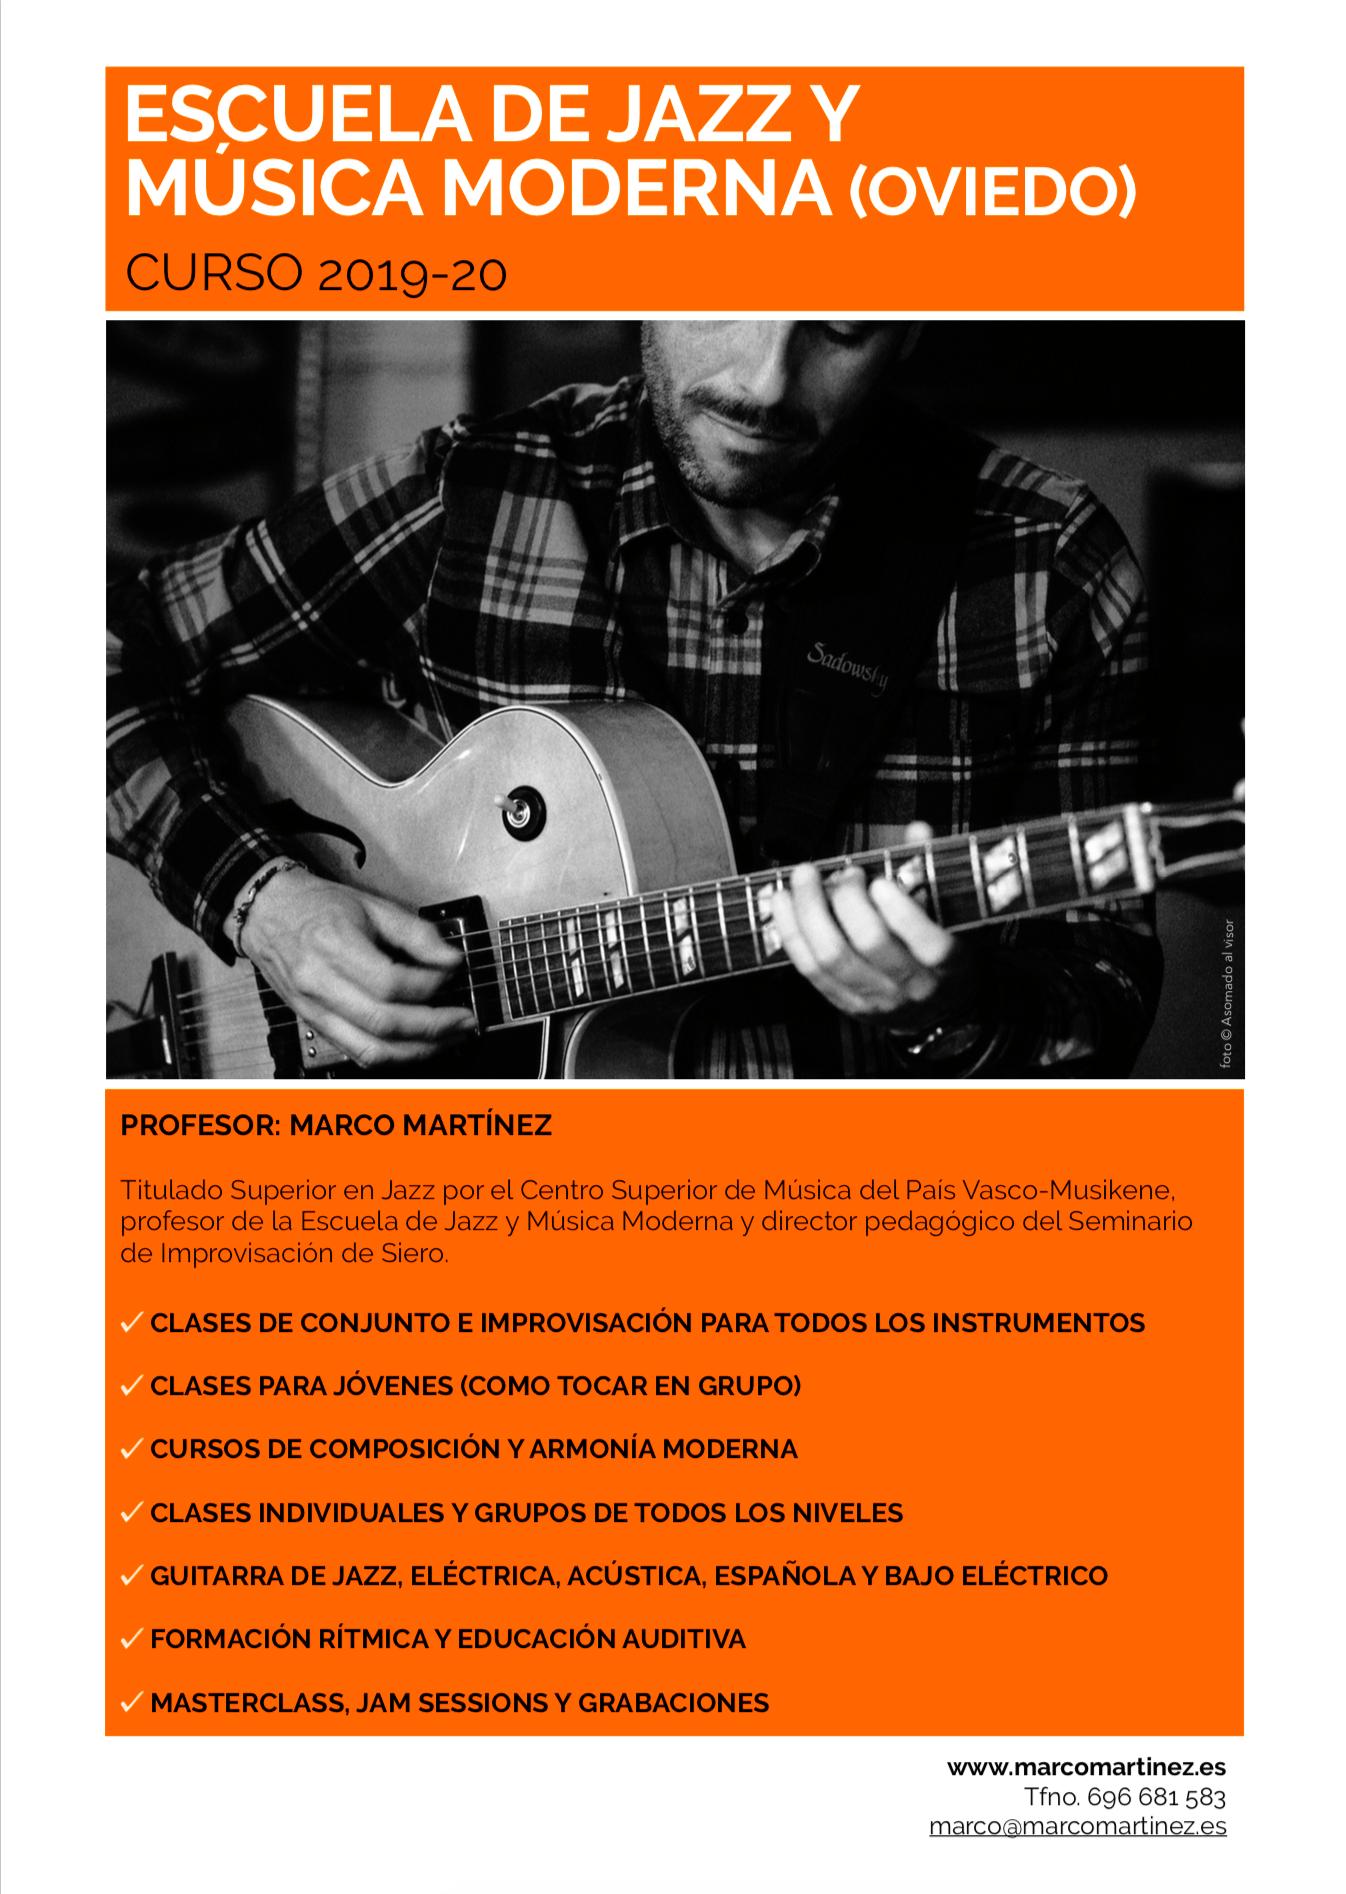 Curso-2019-20-www.marcomartinez.es_